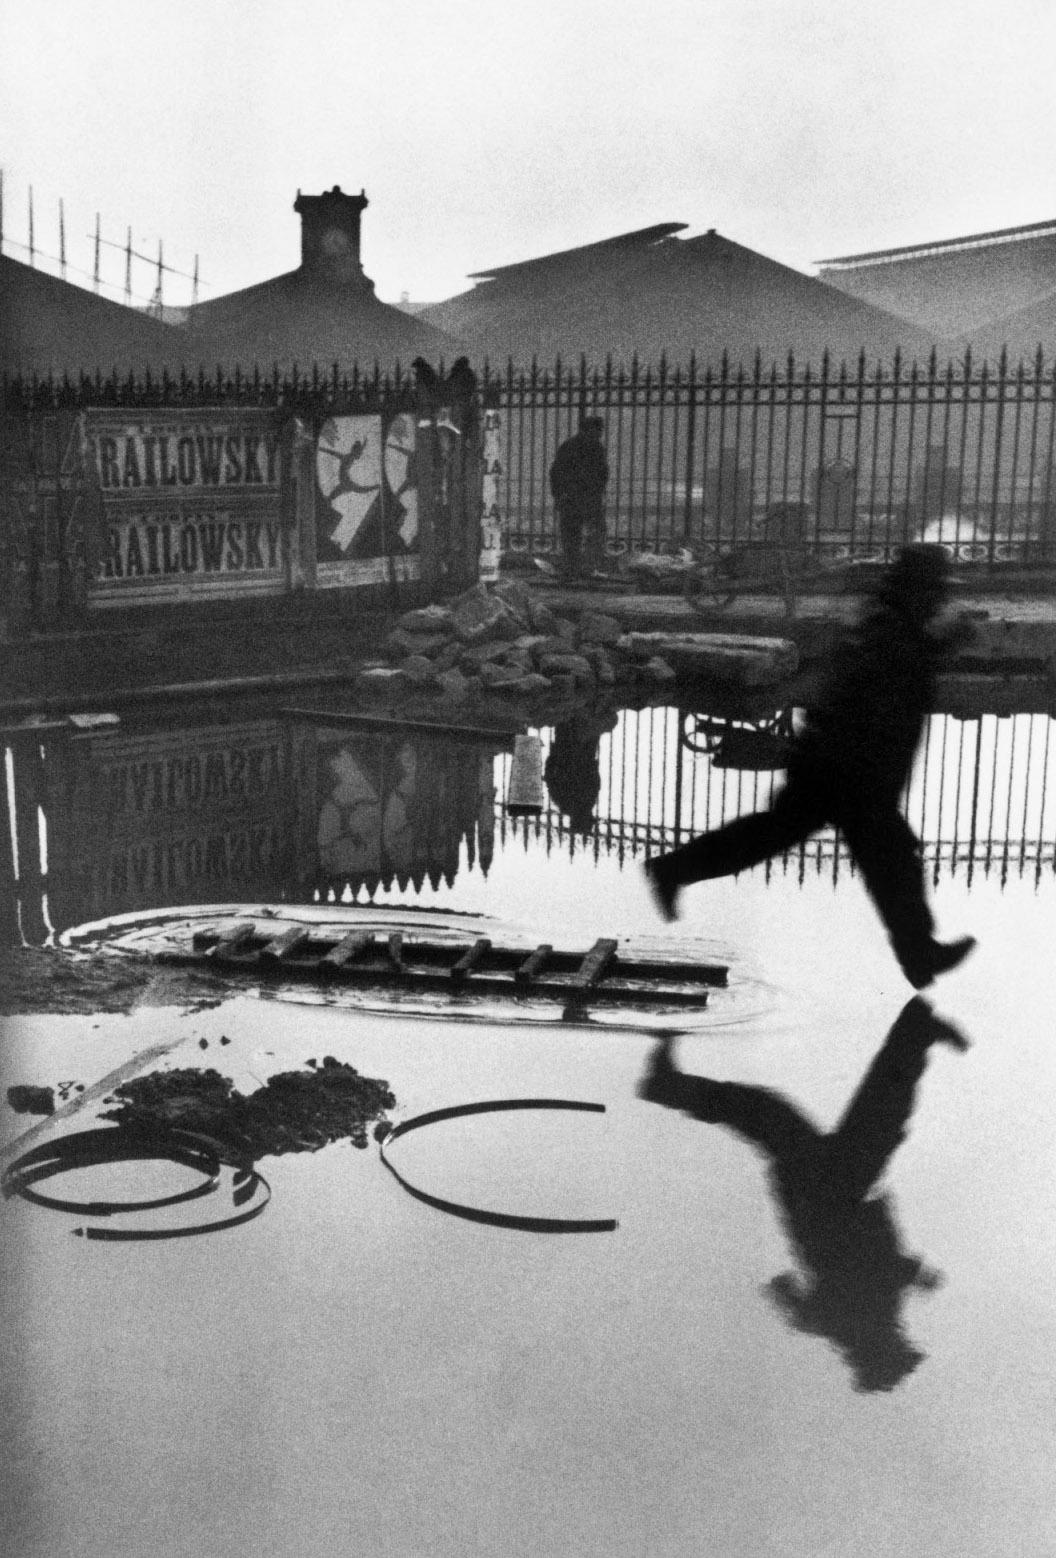 HENRI CARTIER-BRESSON Behind the Gare St. Lazare, 1932